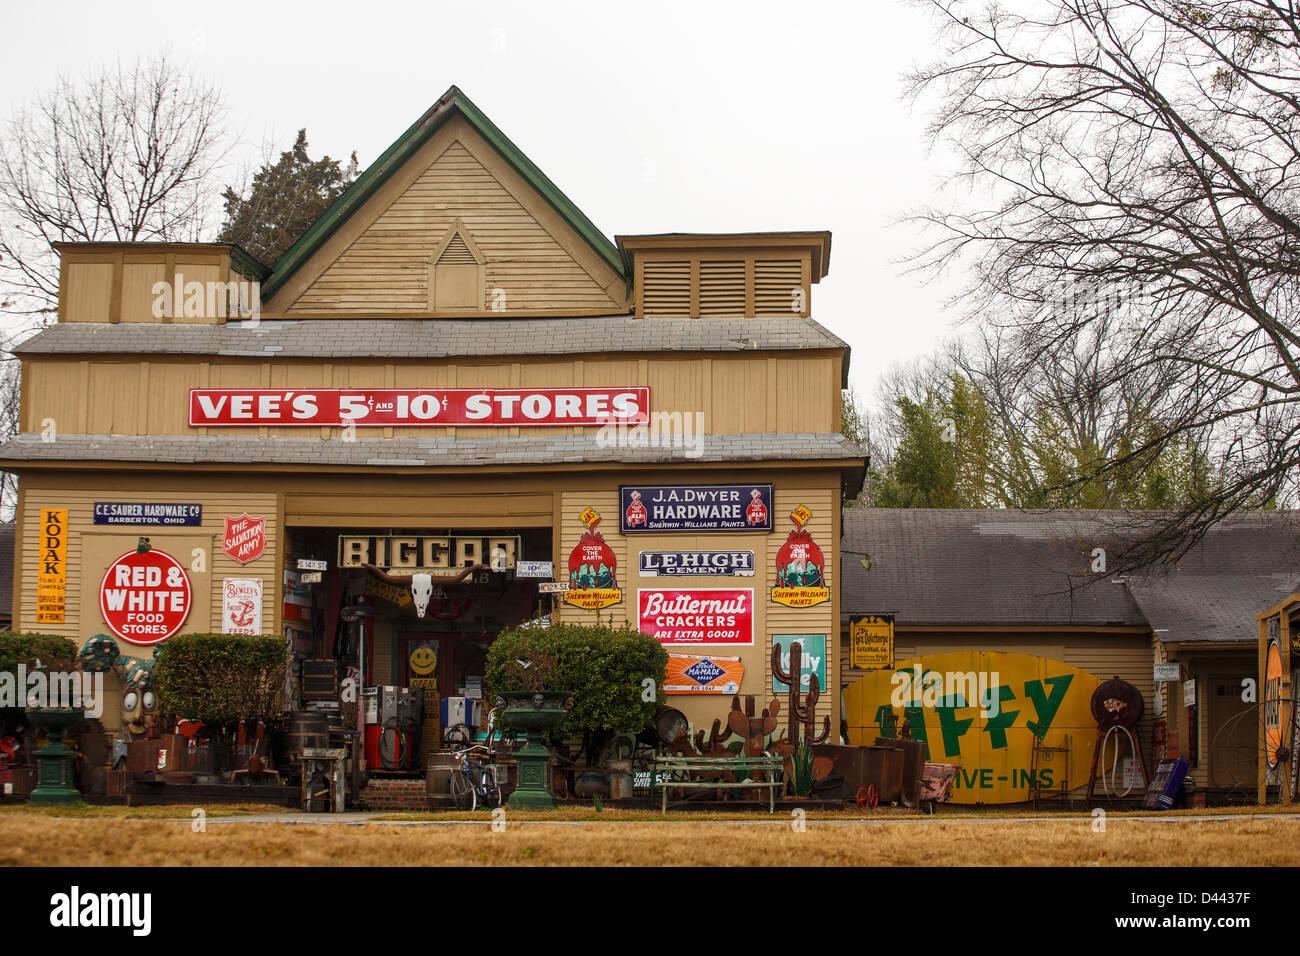 Junk Store Stock Photos & Junk Store Stock Images - Alamy